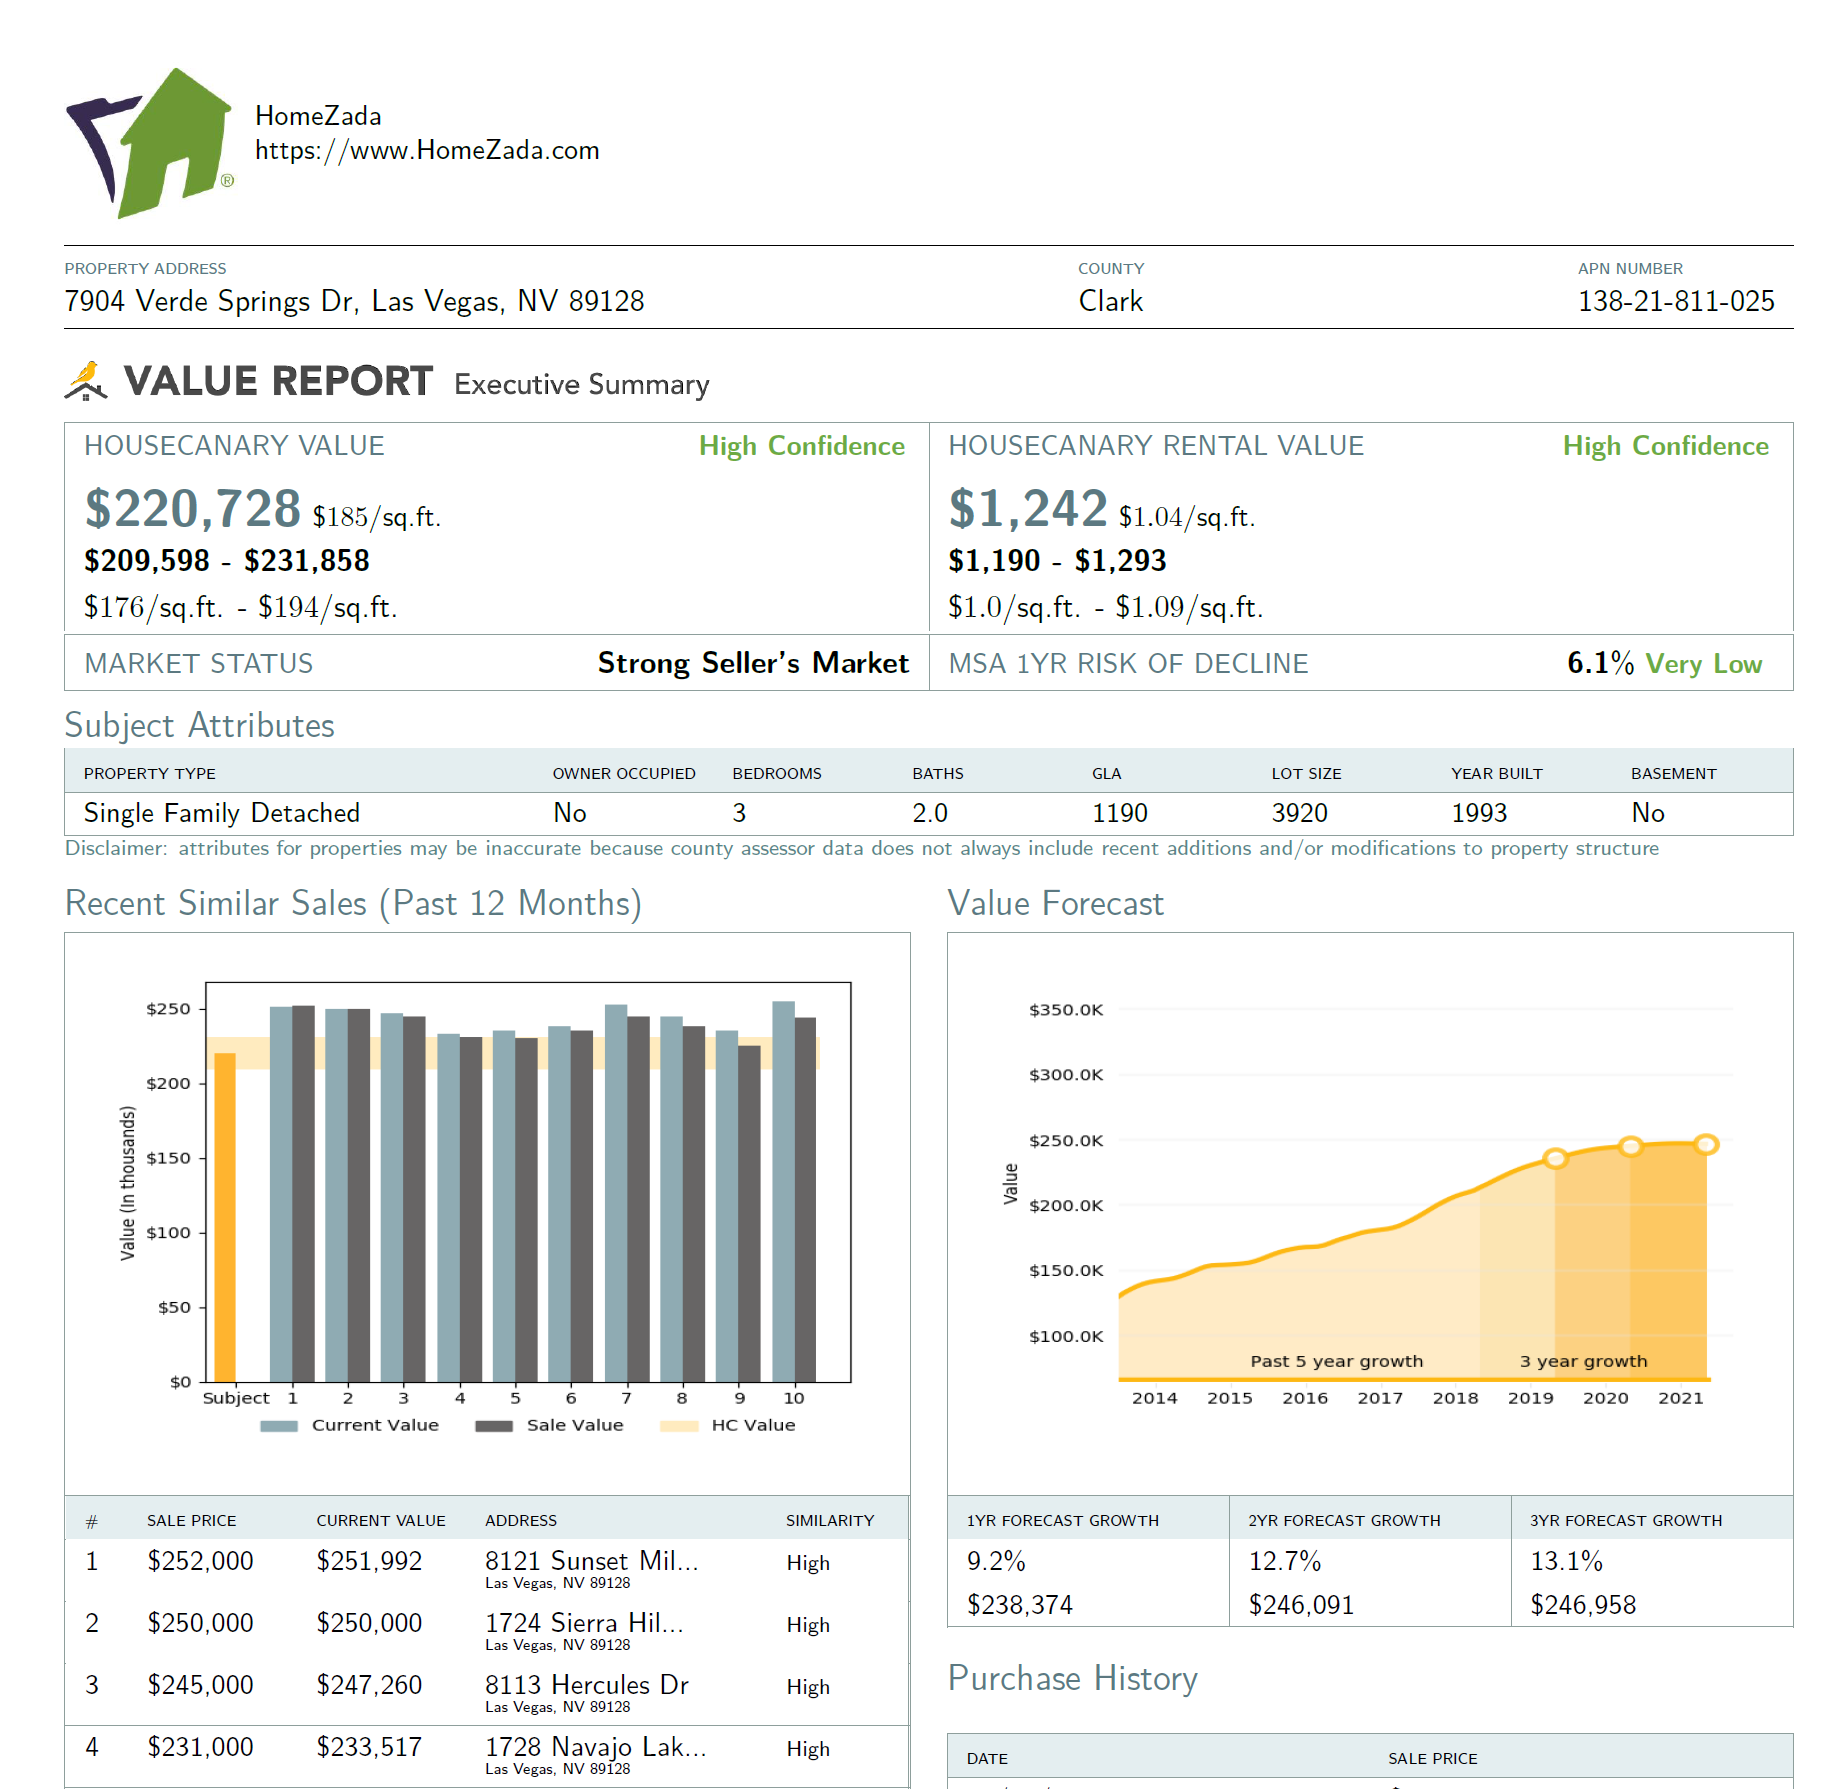 HomeZada New Property Market Analysis Report